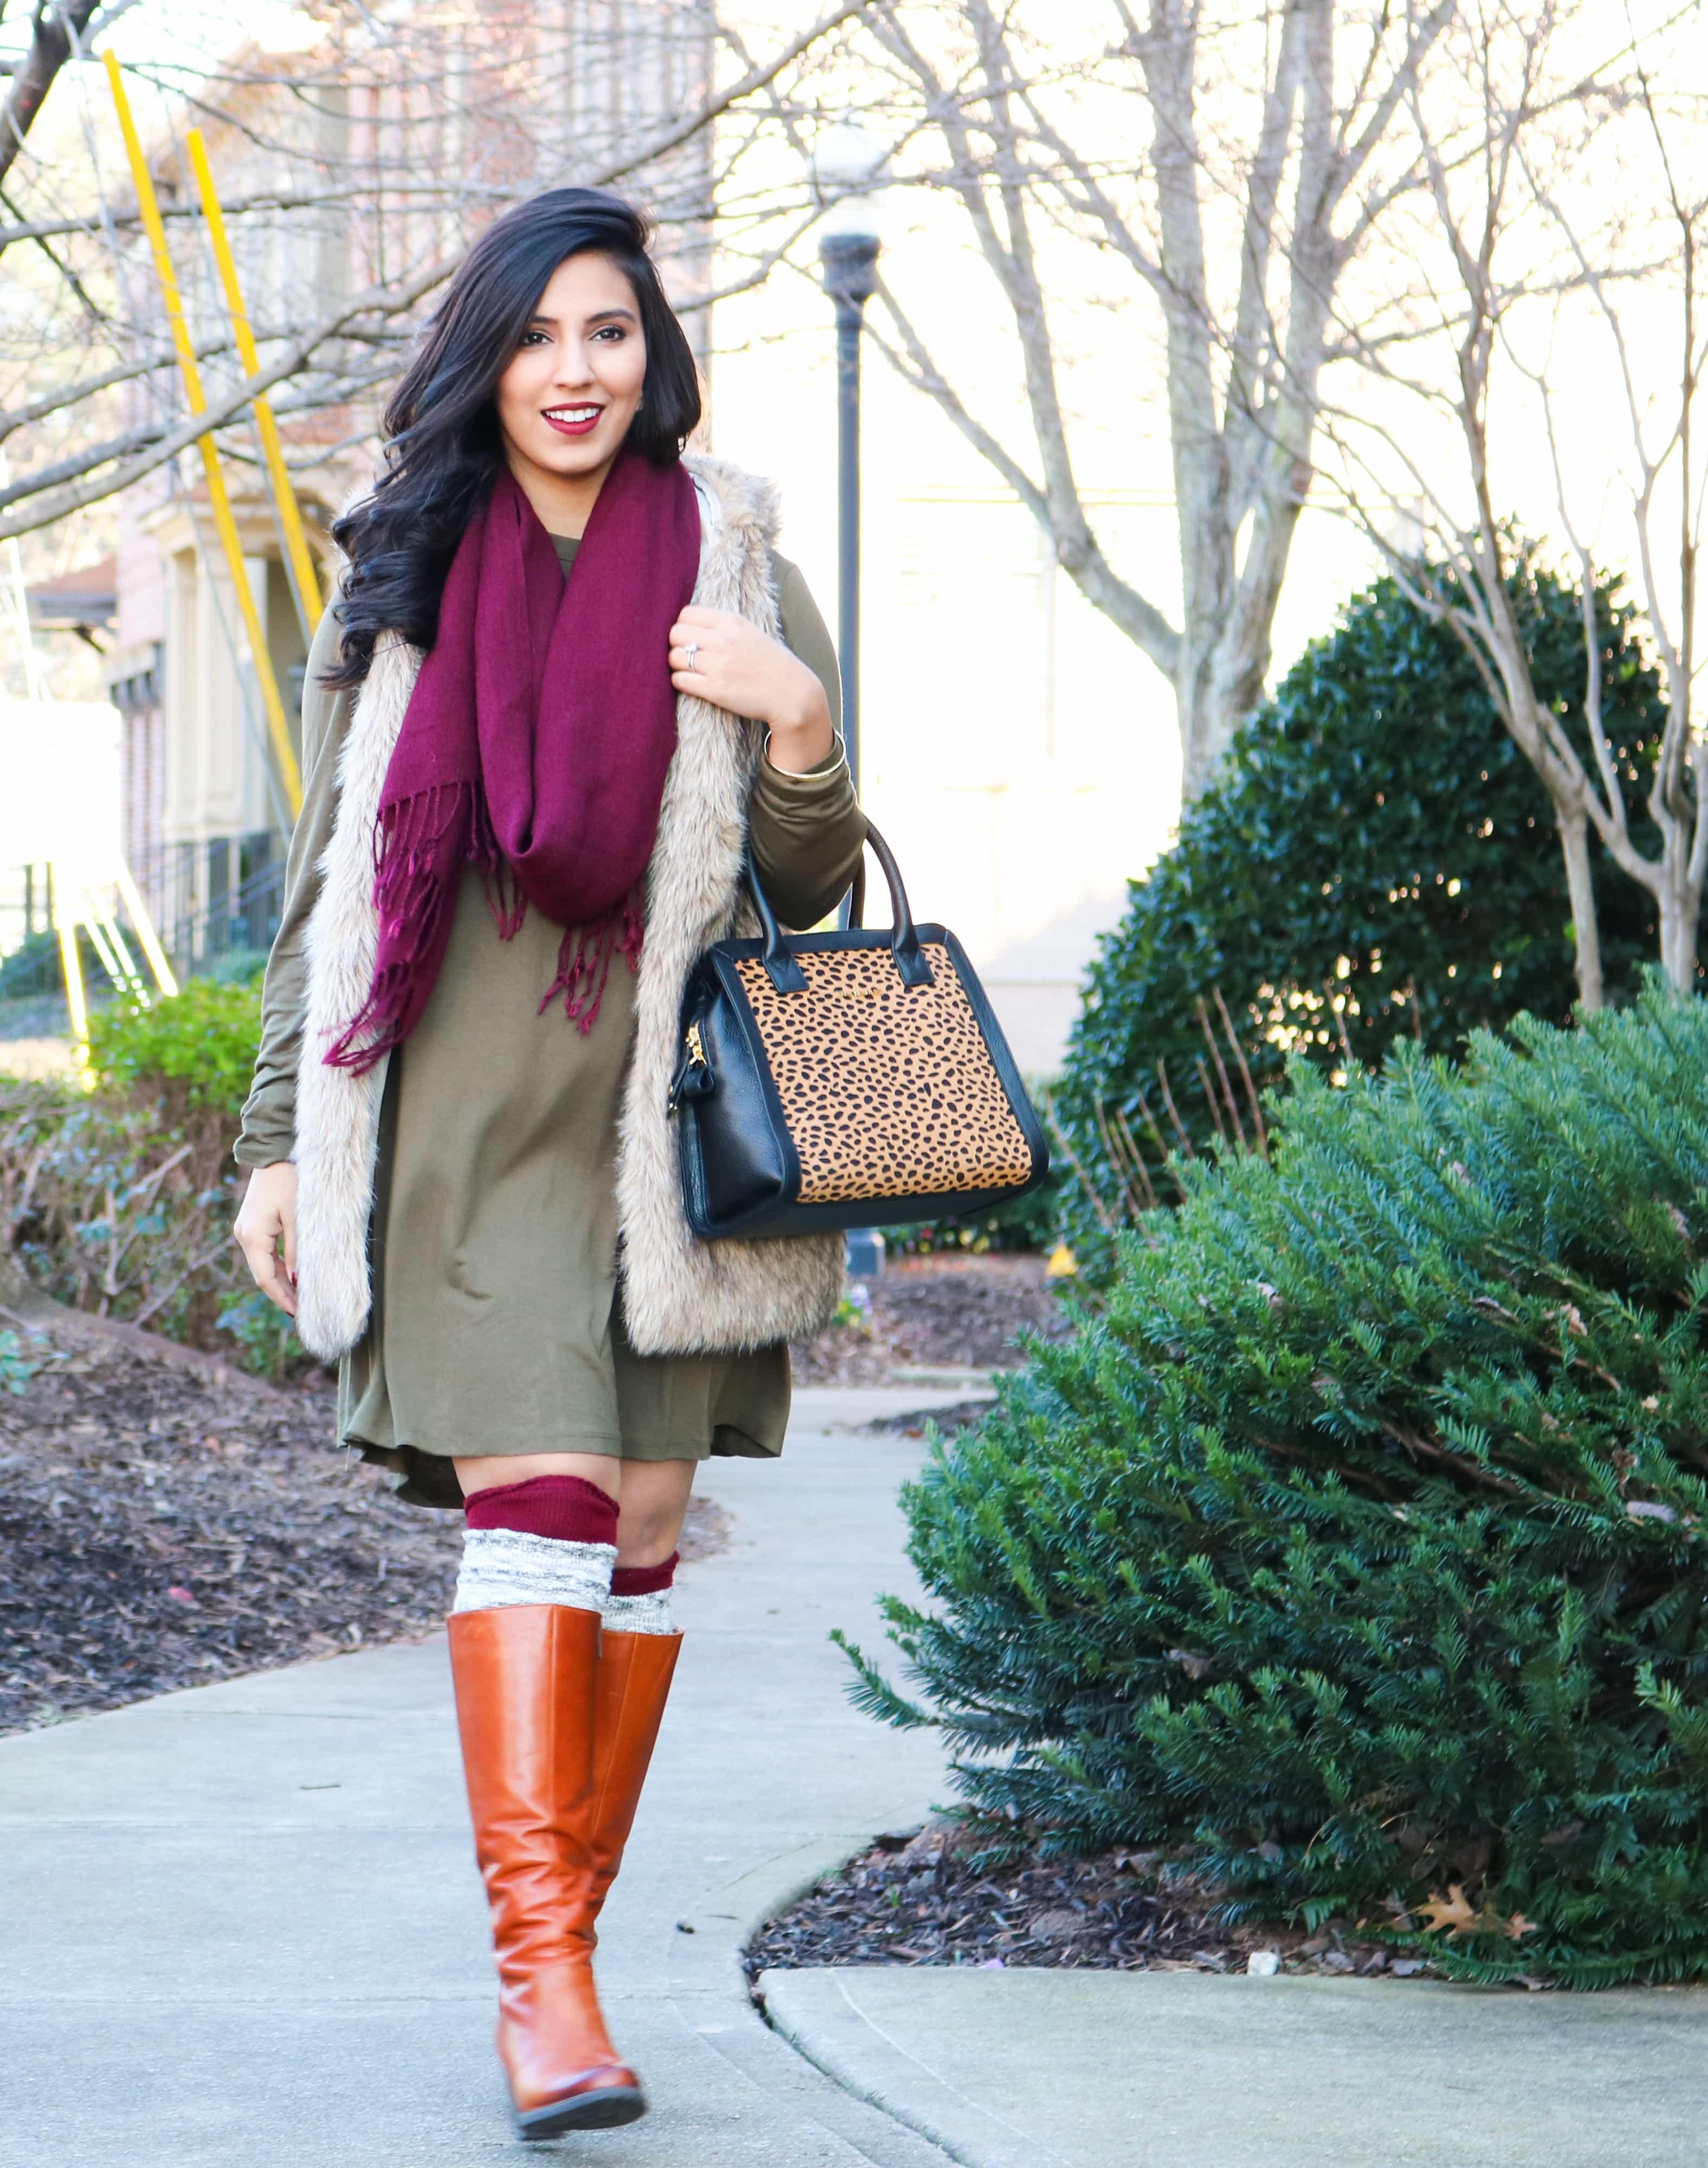 wine scarf, olive dress, faux fur vest, vera bradley, vera bradley cheetah purse, alex and ani, grey socks, camel boots, kvd vampira, cheetah bag